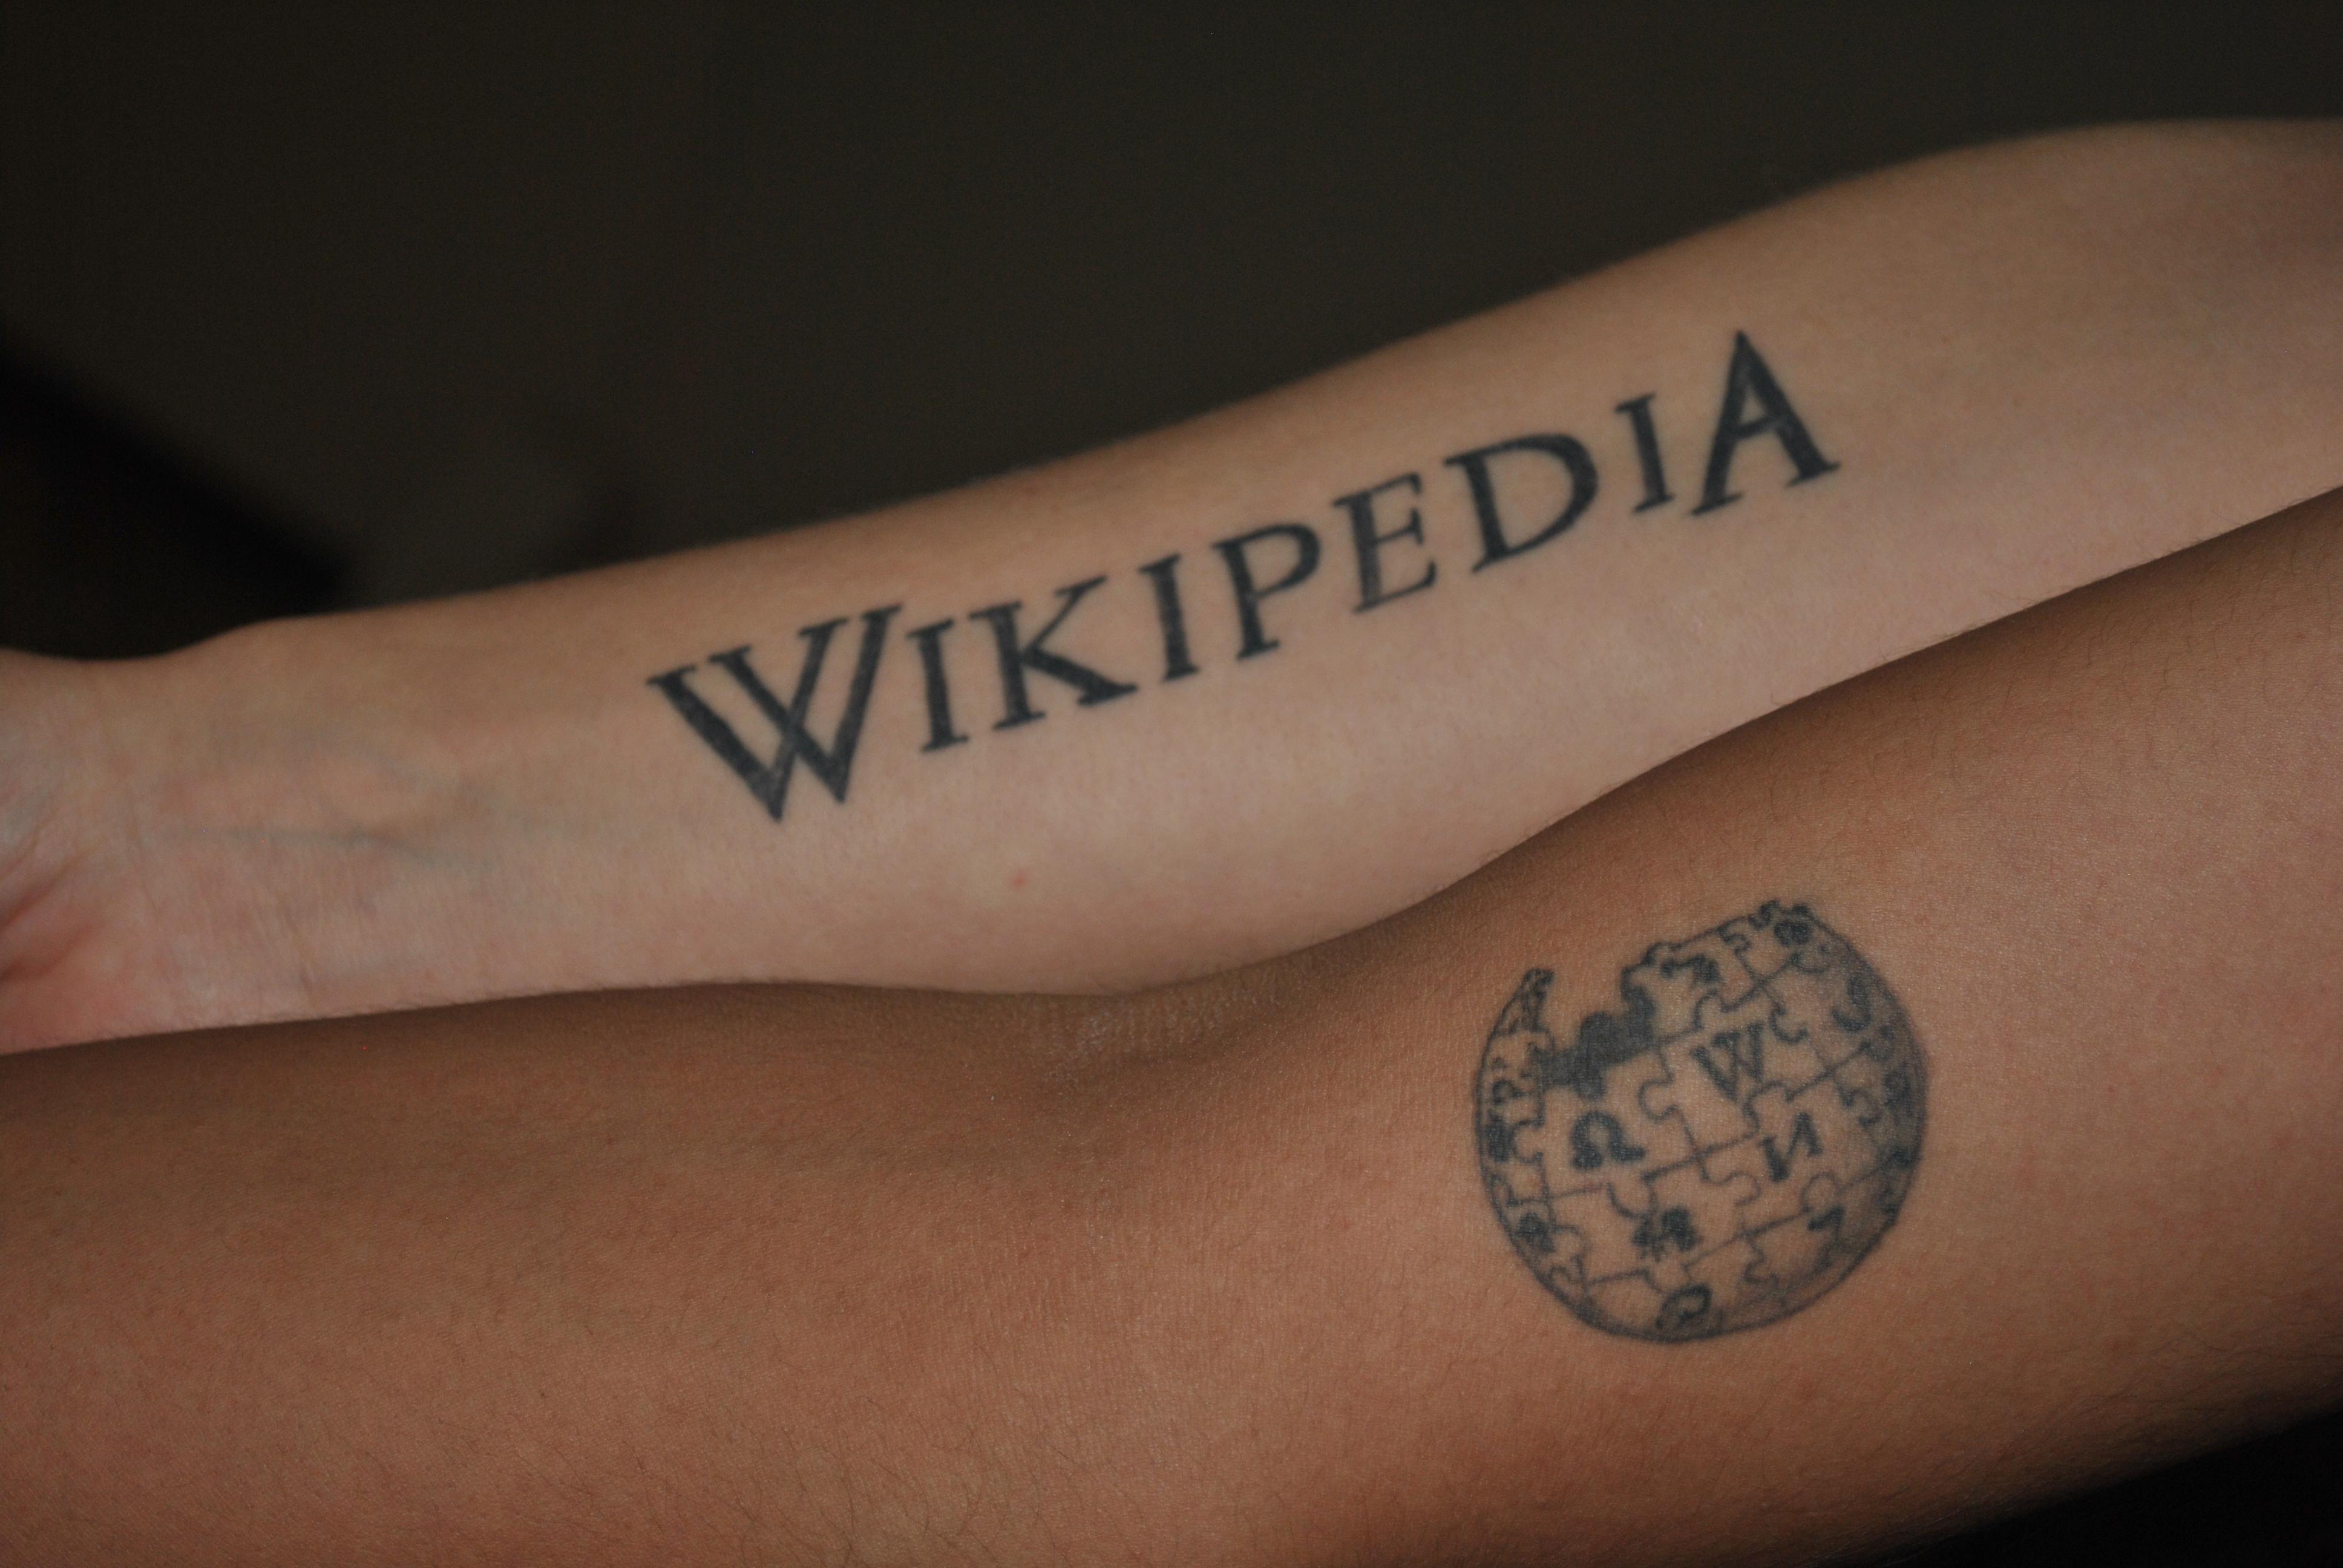 filewiki on tke skin wikipedia tattoojpg wikimedia